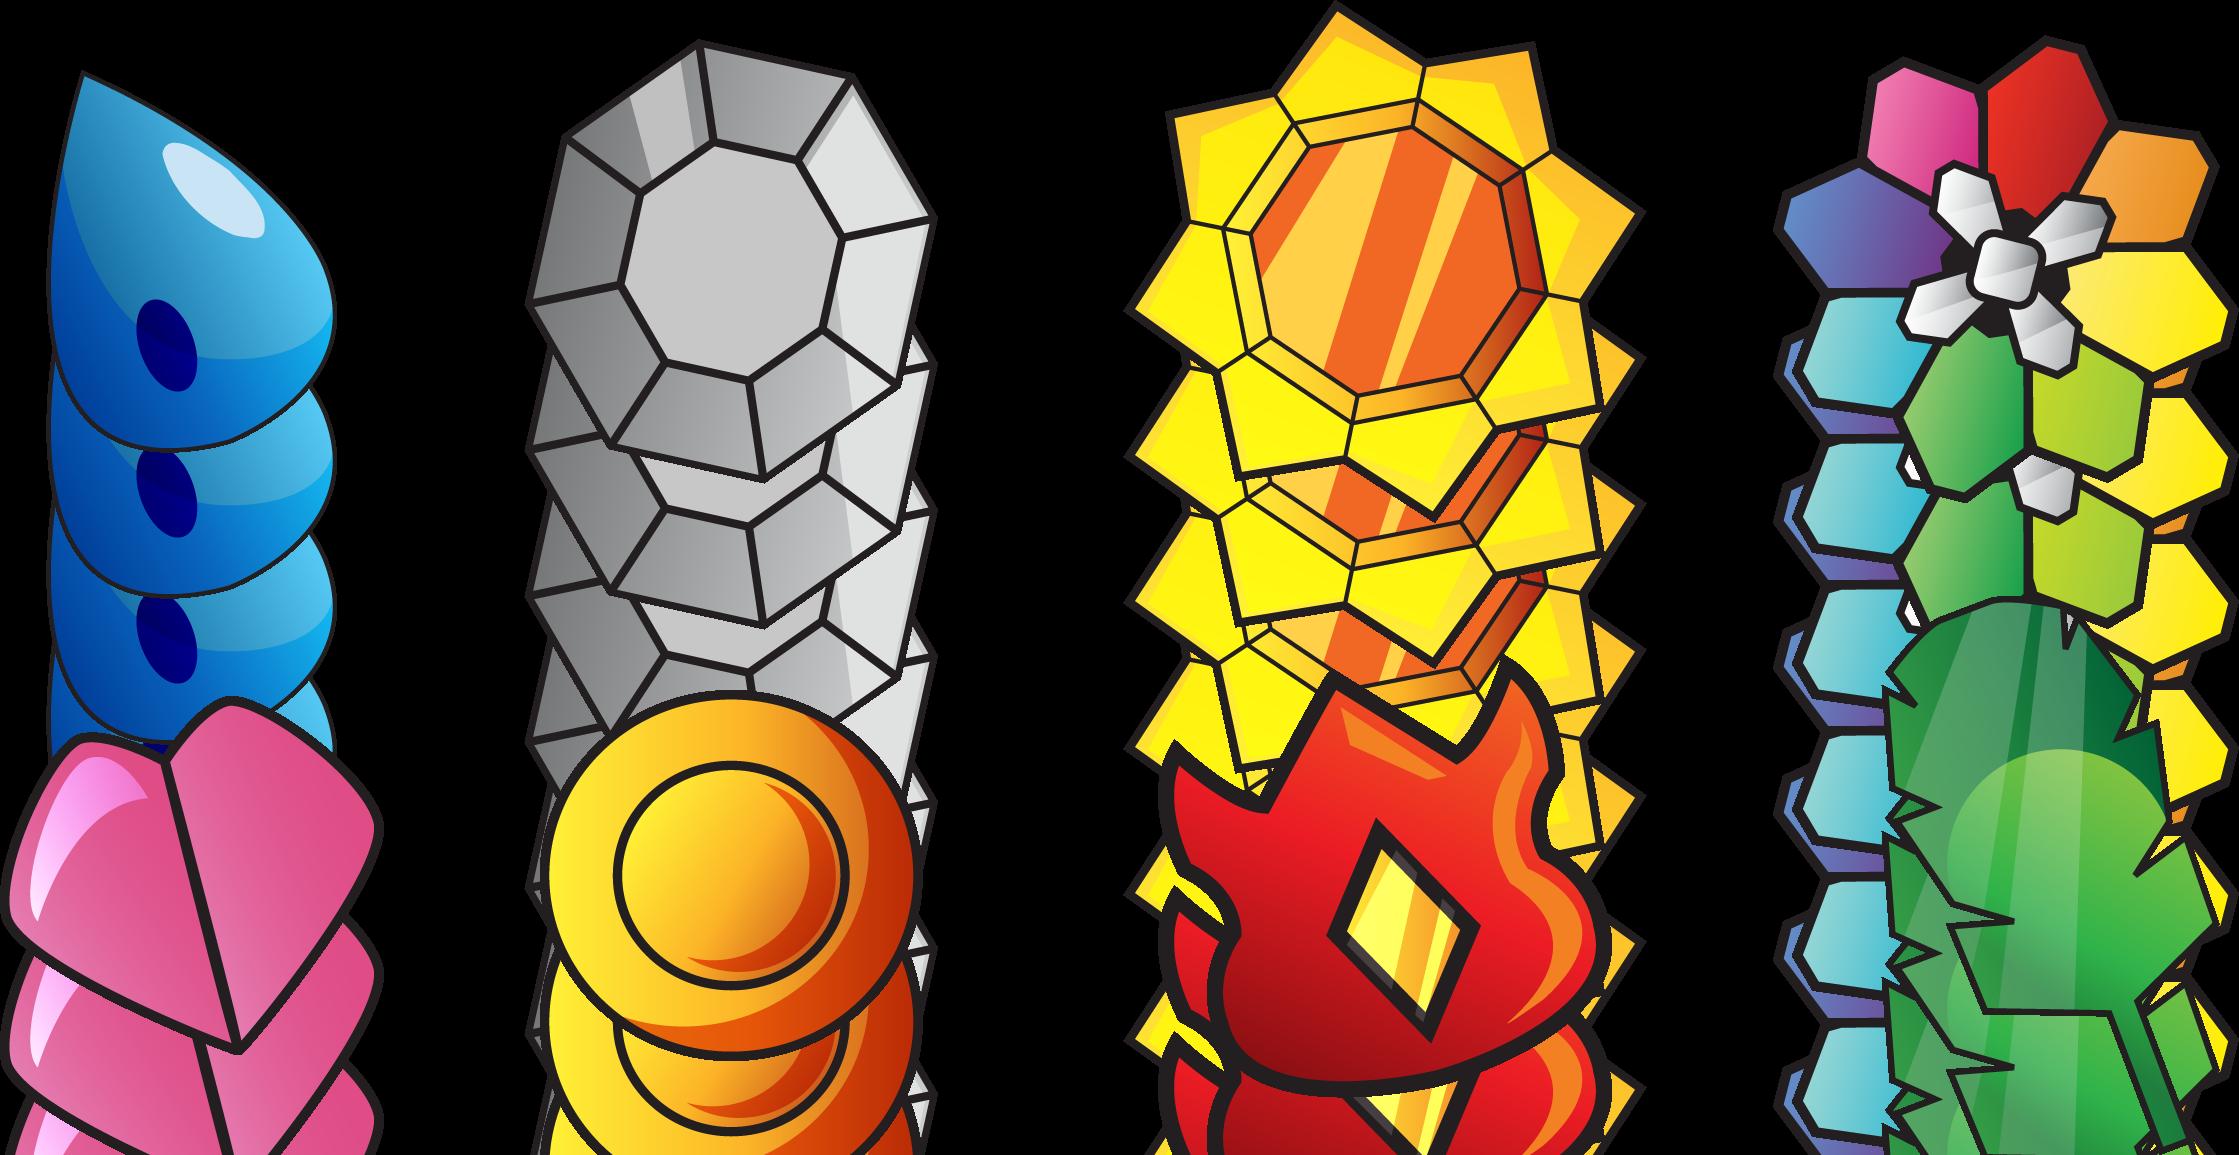 Pokemon Kanto Gym Badges 2239 1155 Pokemon Badges Pokemon Gym Badges Pokemon